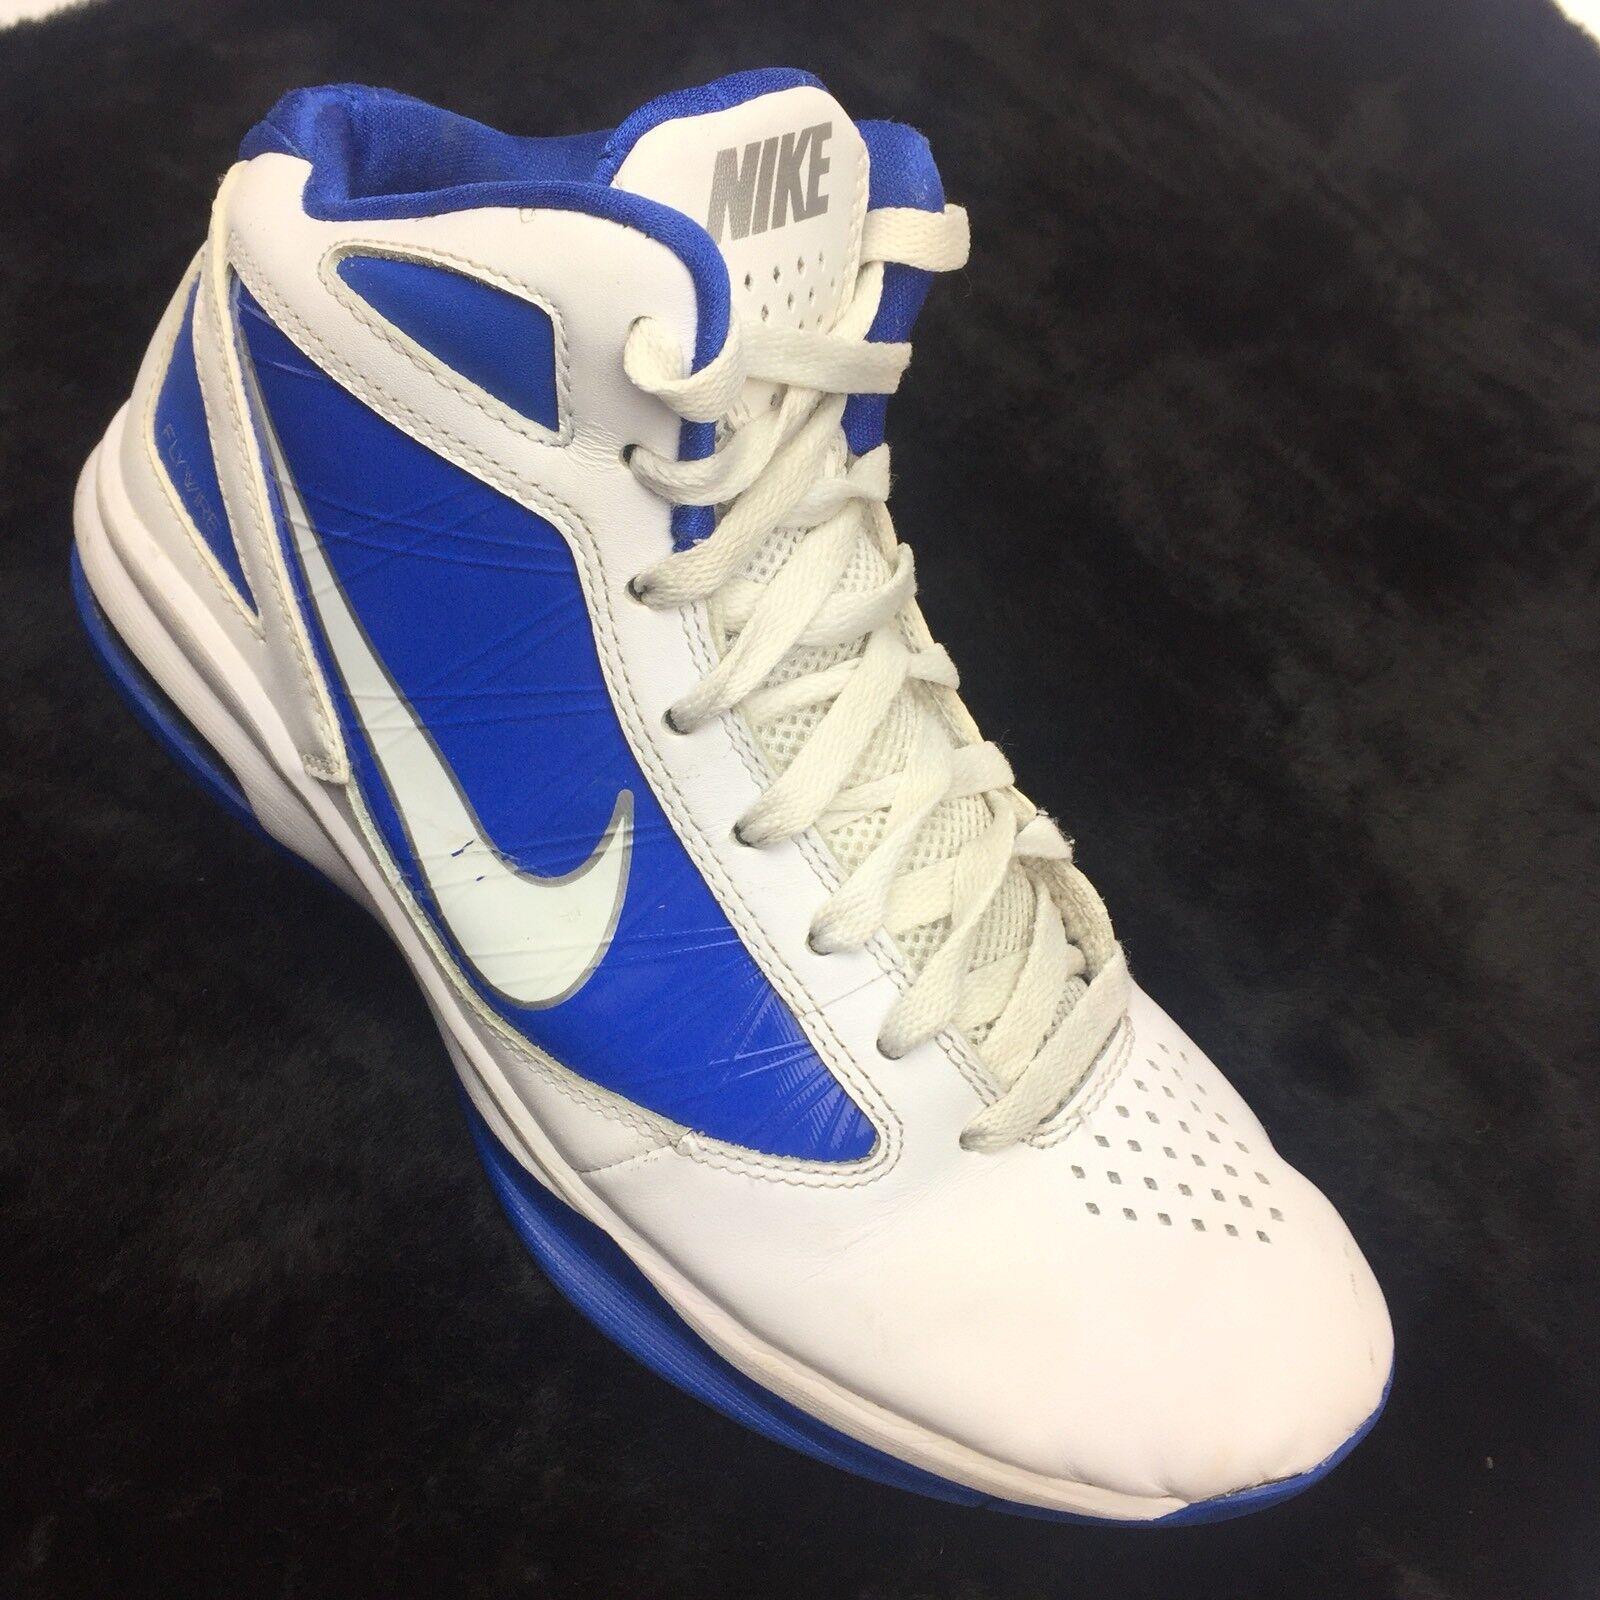 NIKE Air Max Destiny Basketball Shoes 454148-103 Women's Sz 9  Seasonal price cuts, discount benefits